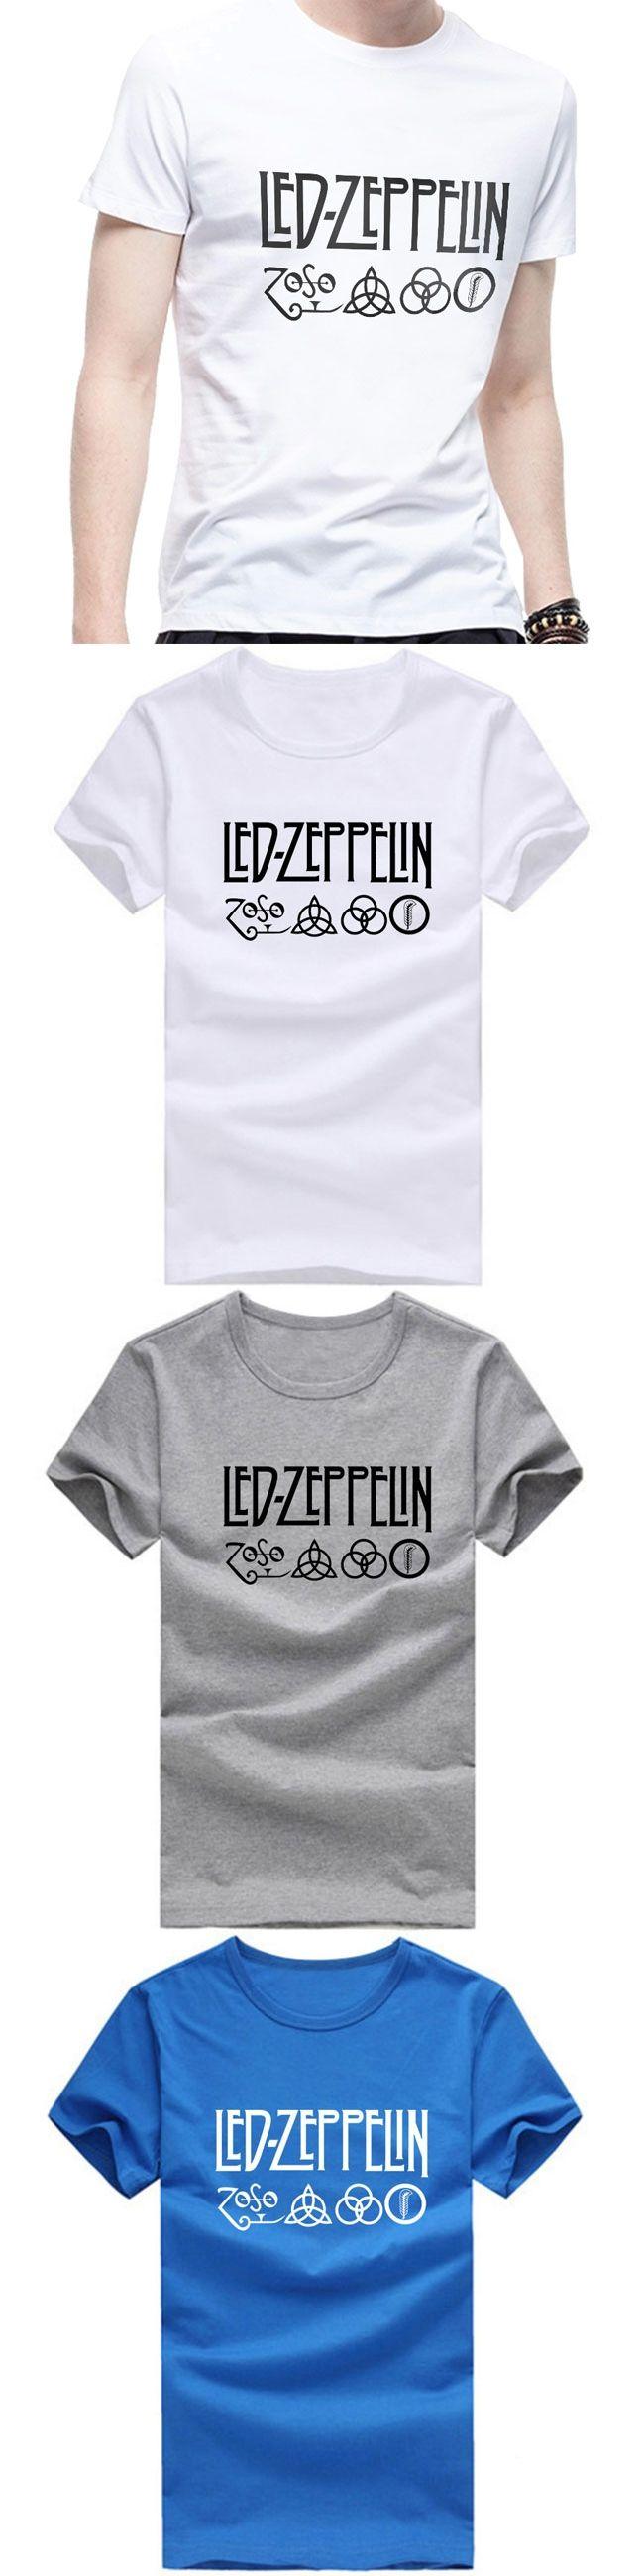 The 25 best led zeppelin t shirt ideas on pinterest slash band led zeppelin fashion men t shirts round neck short sleeve cotton hip hop man t biocorpaavc